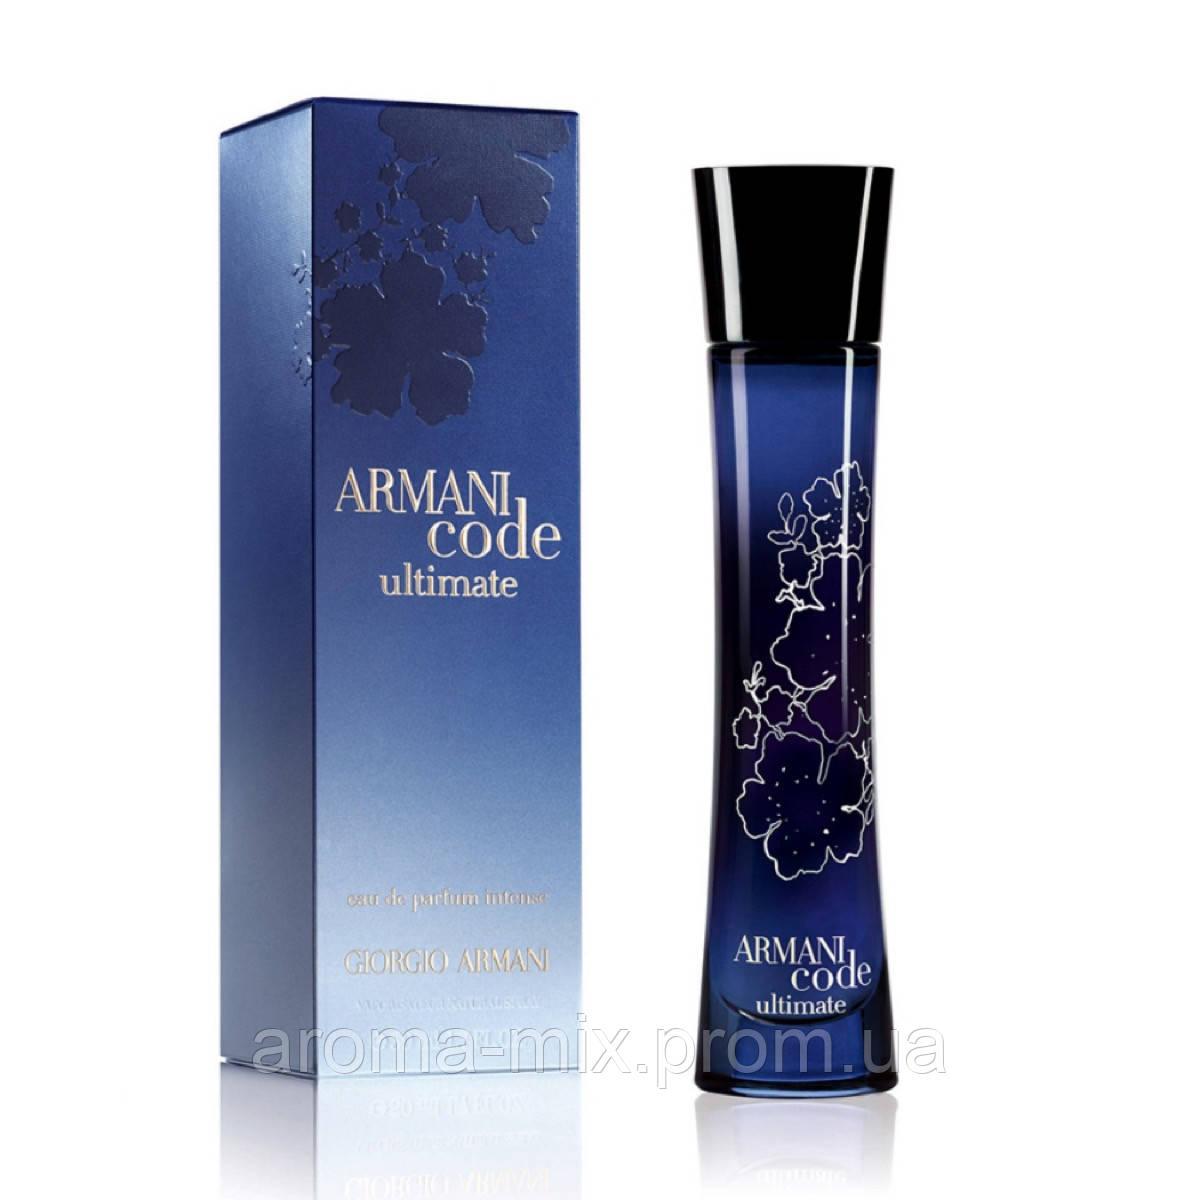 Giorgio Armani Armani Code women - женский парфюм